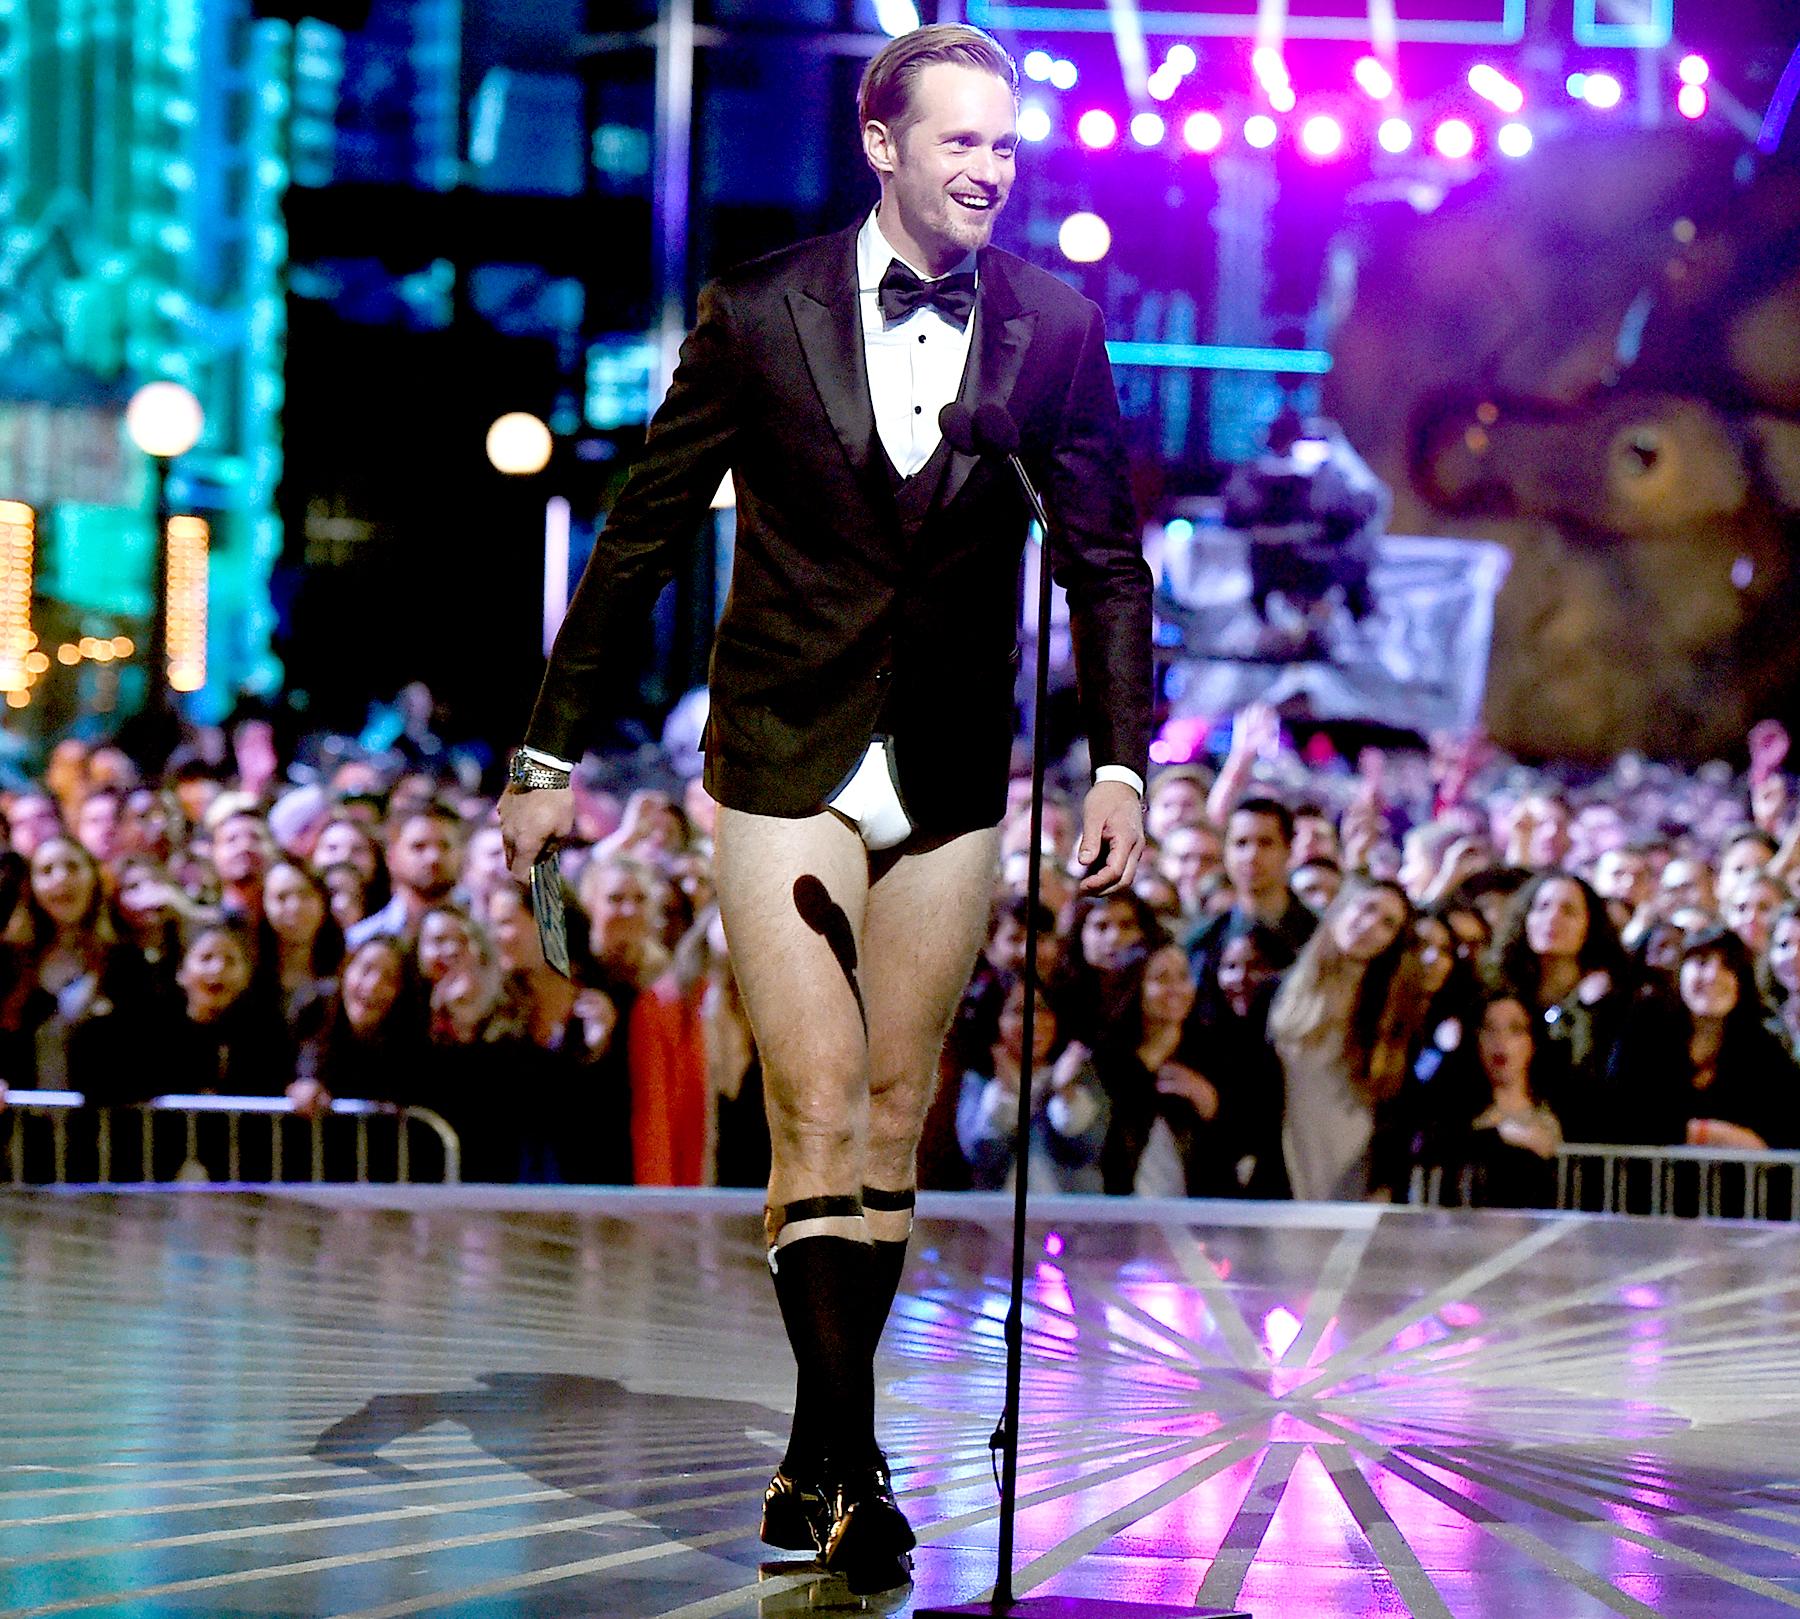 Alexander Skarsgard speaks onstage during the 2016 MTV Movie Awards.